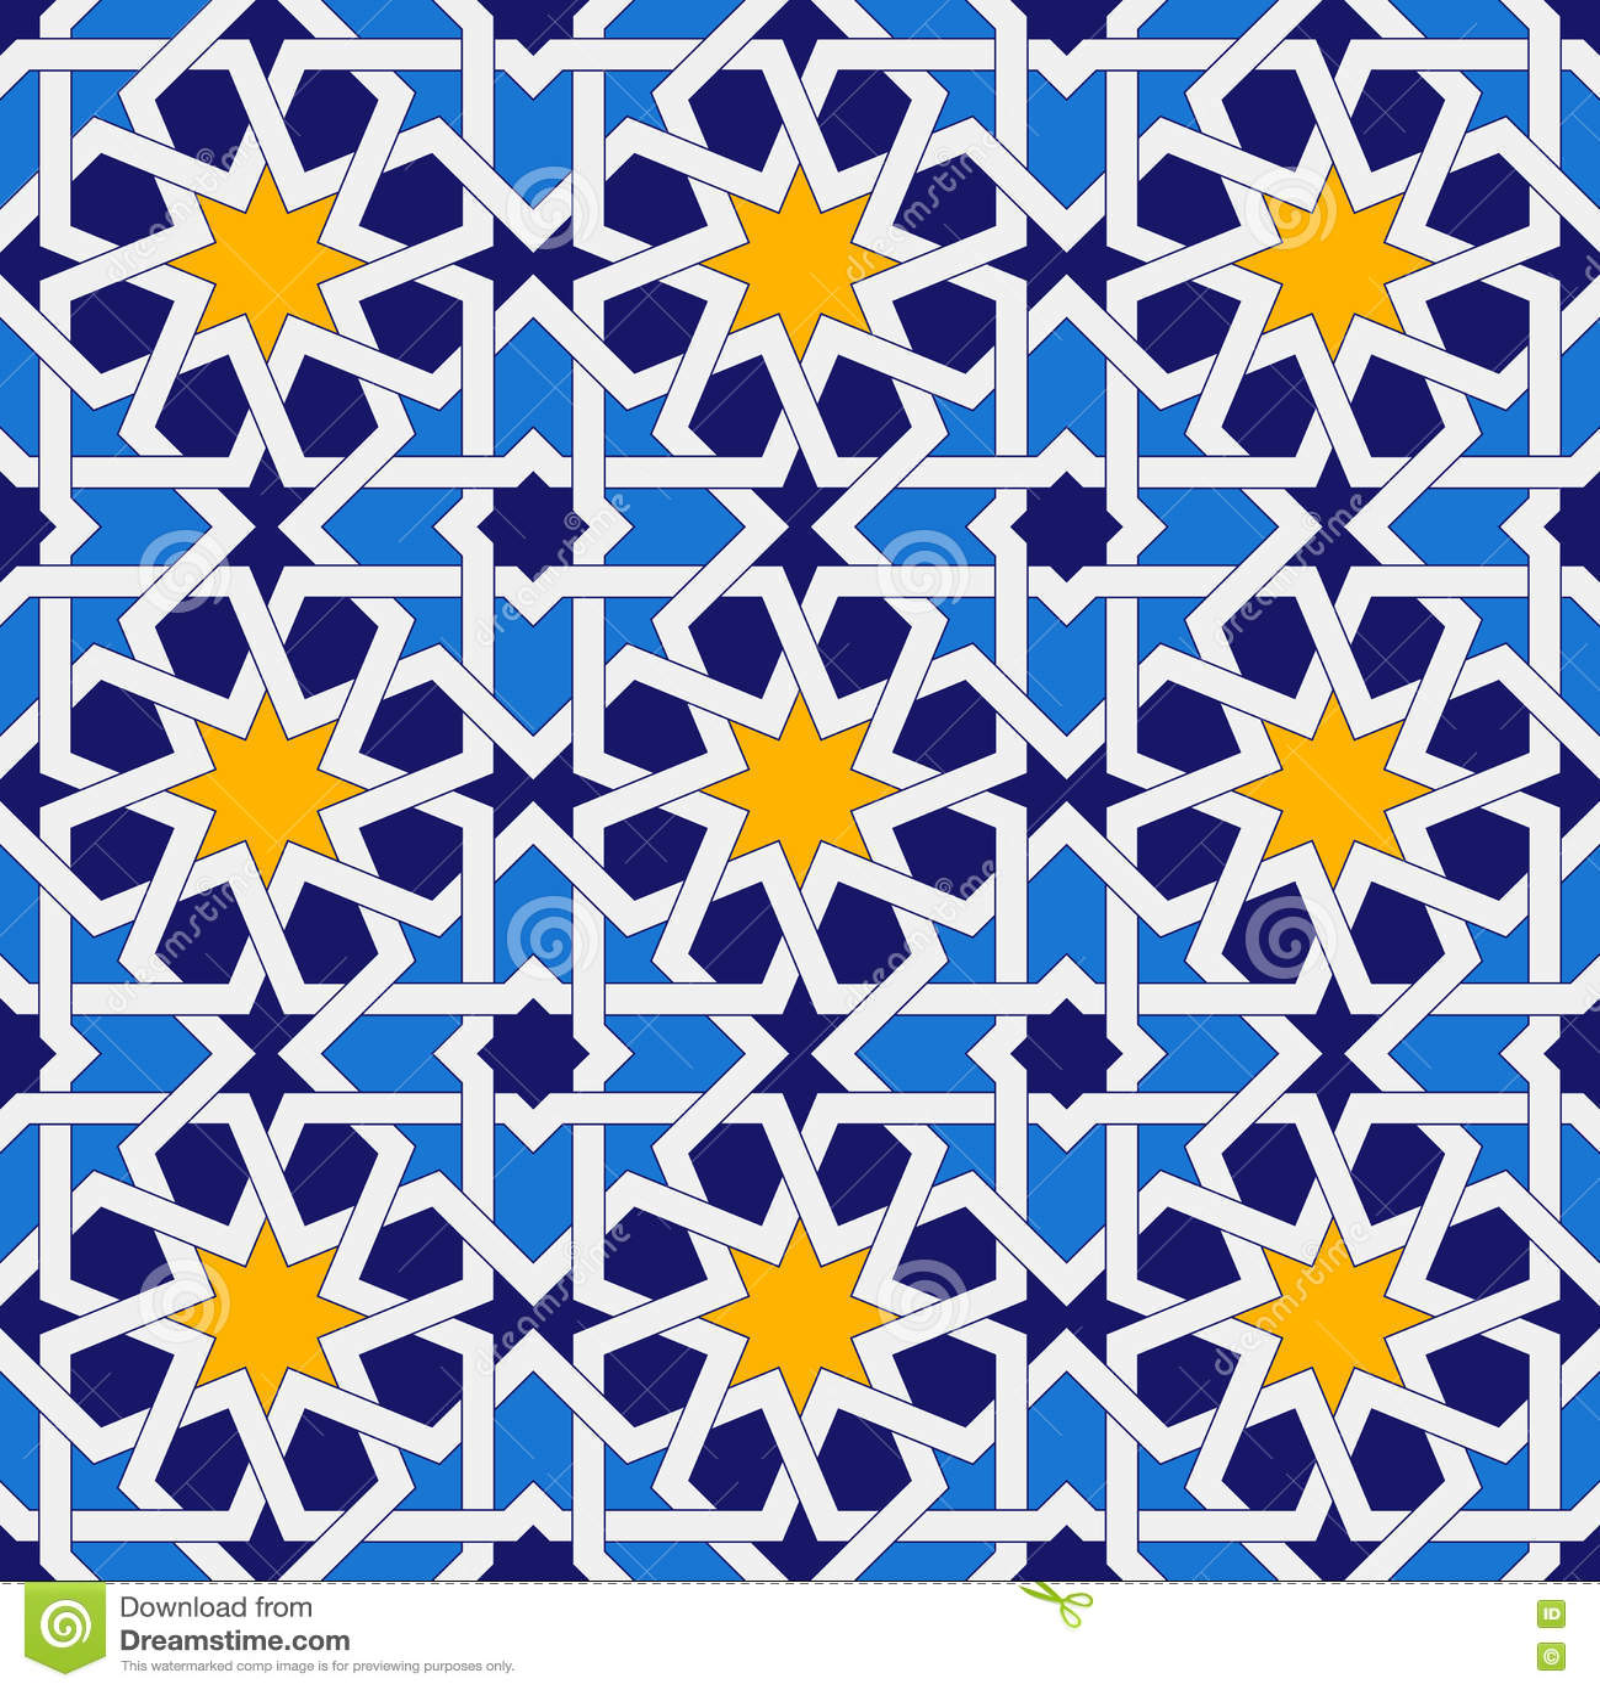 Simple Islamic Art Patterns Christopherbathum Co